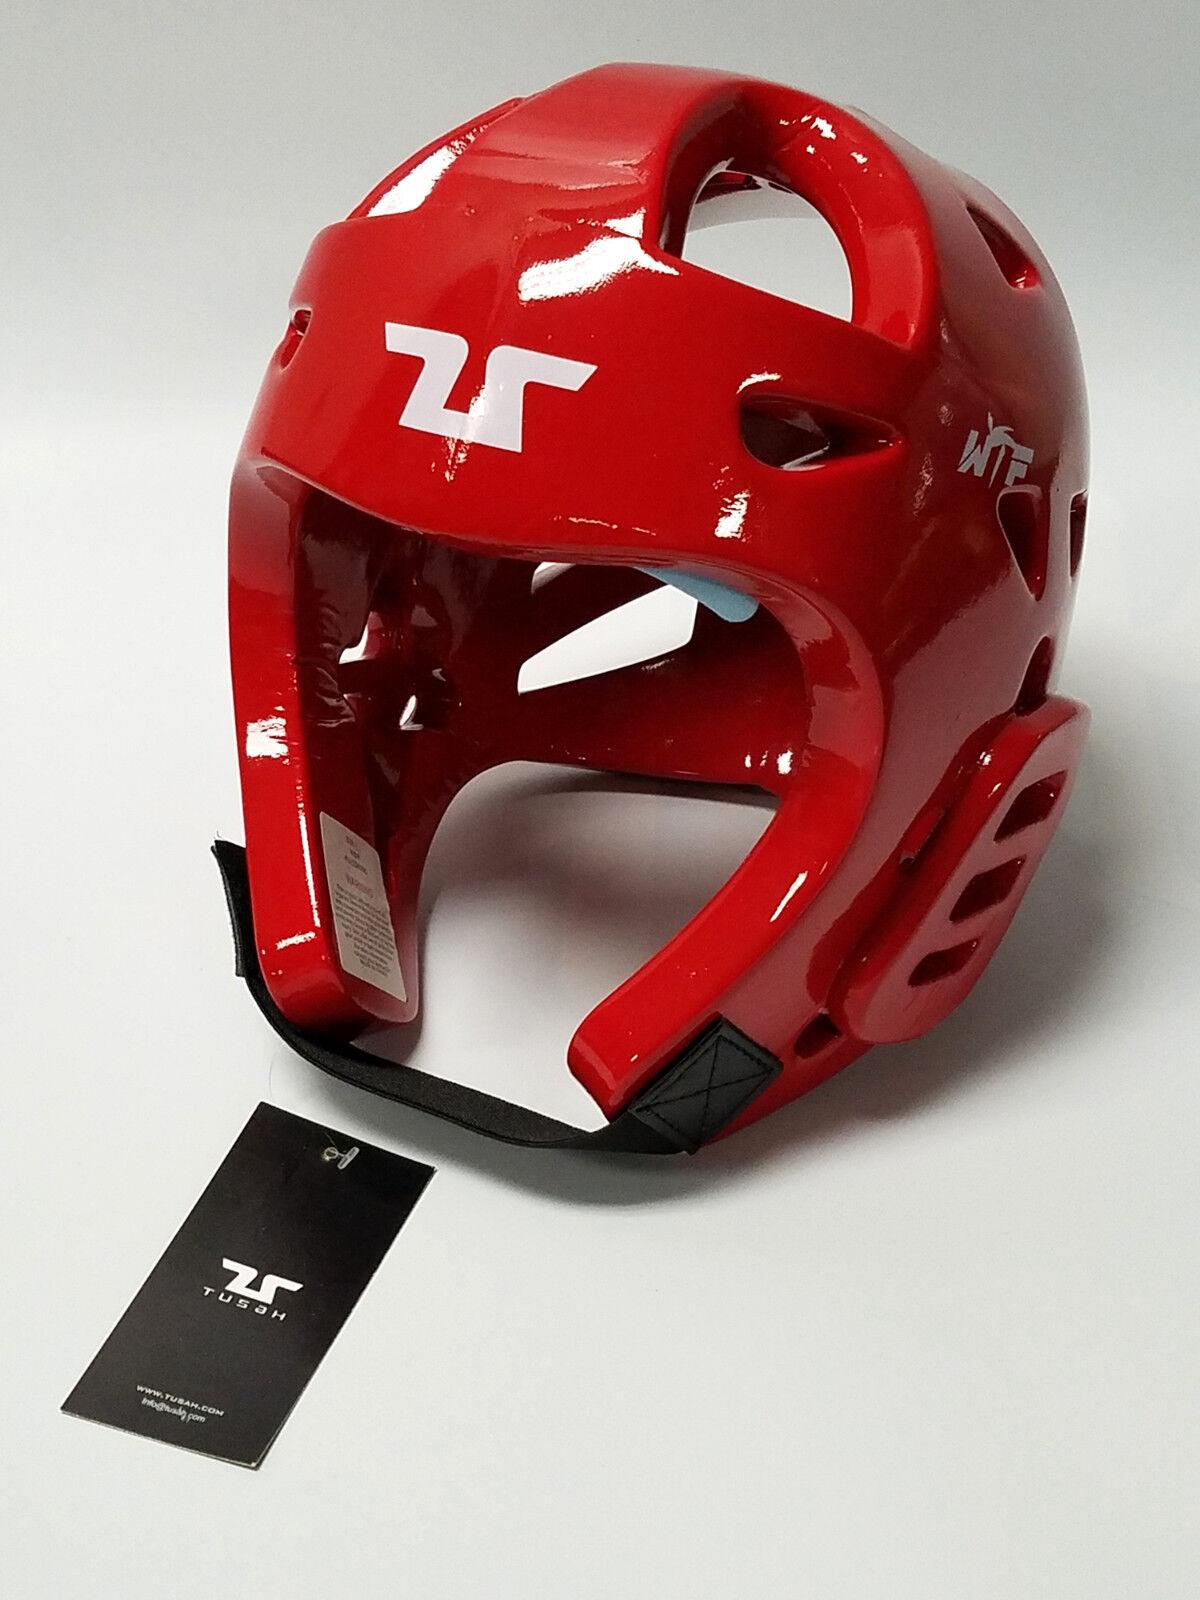 Tusah Taekwondo TKD Red Head Guard Predector WTF Approved